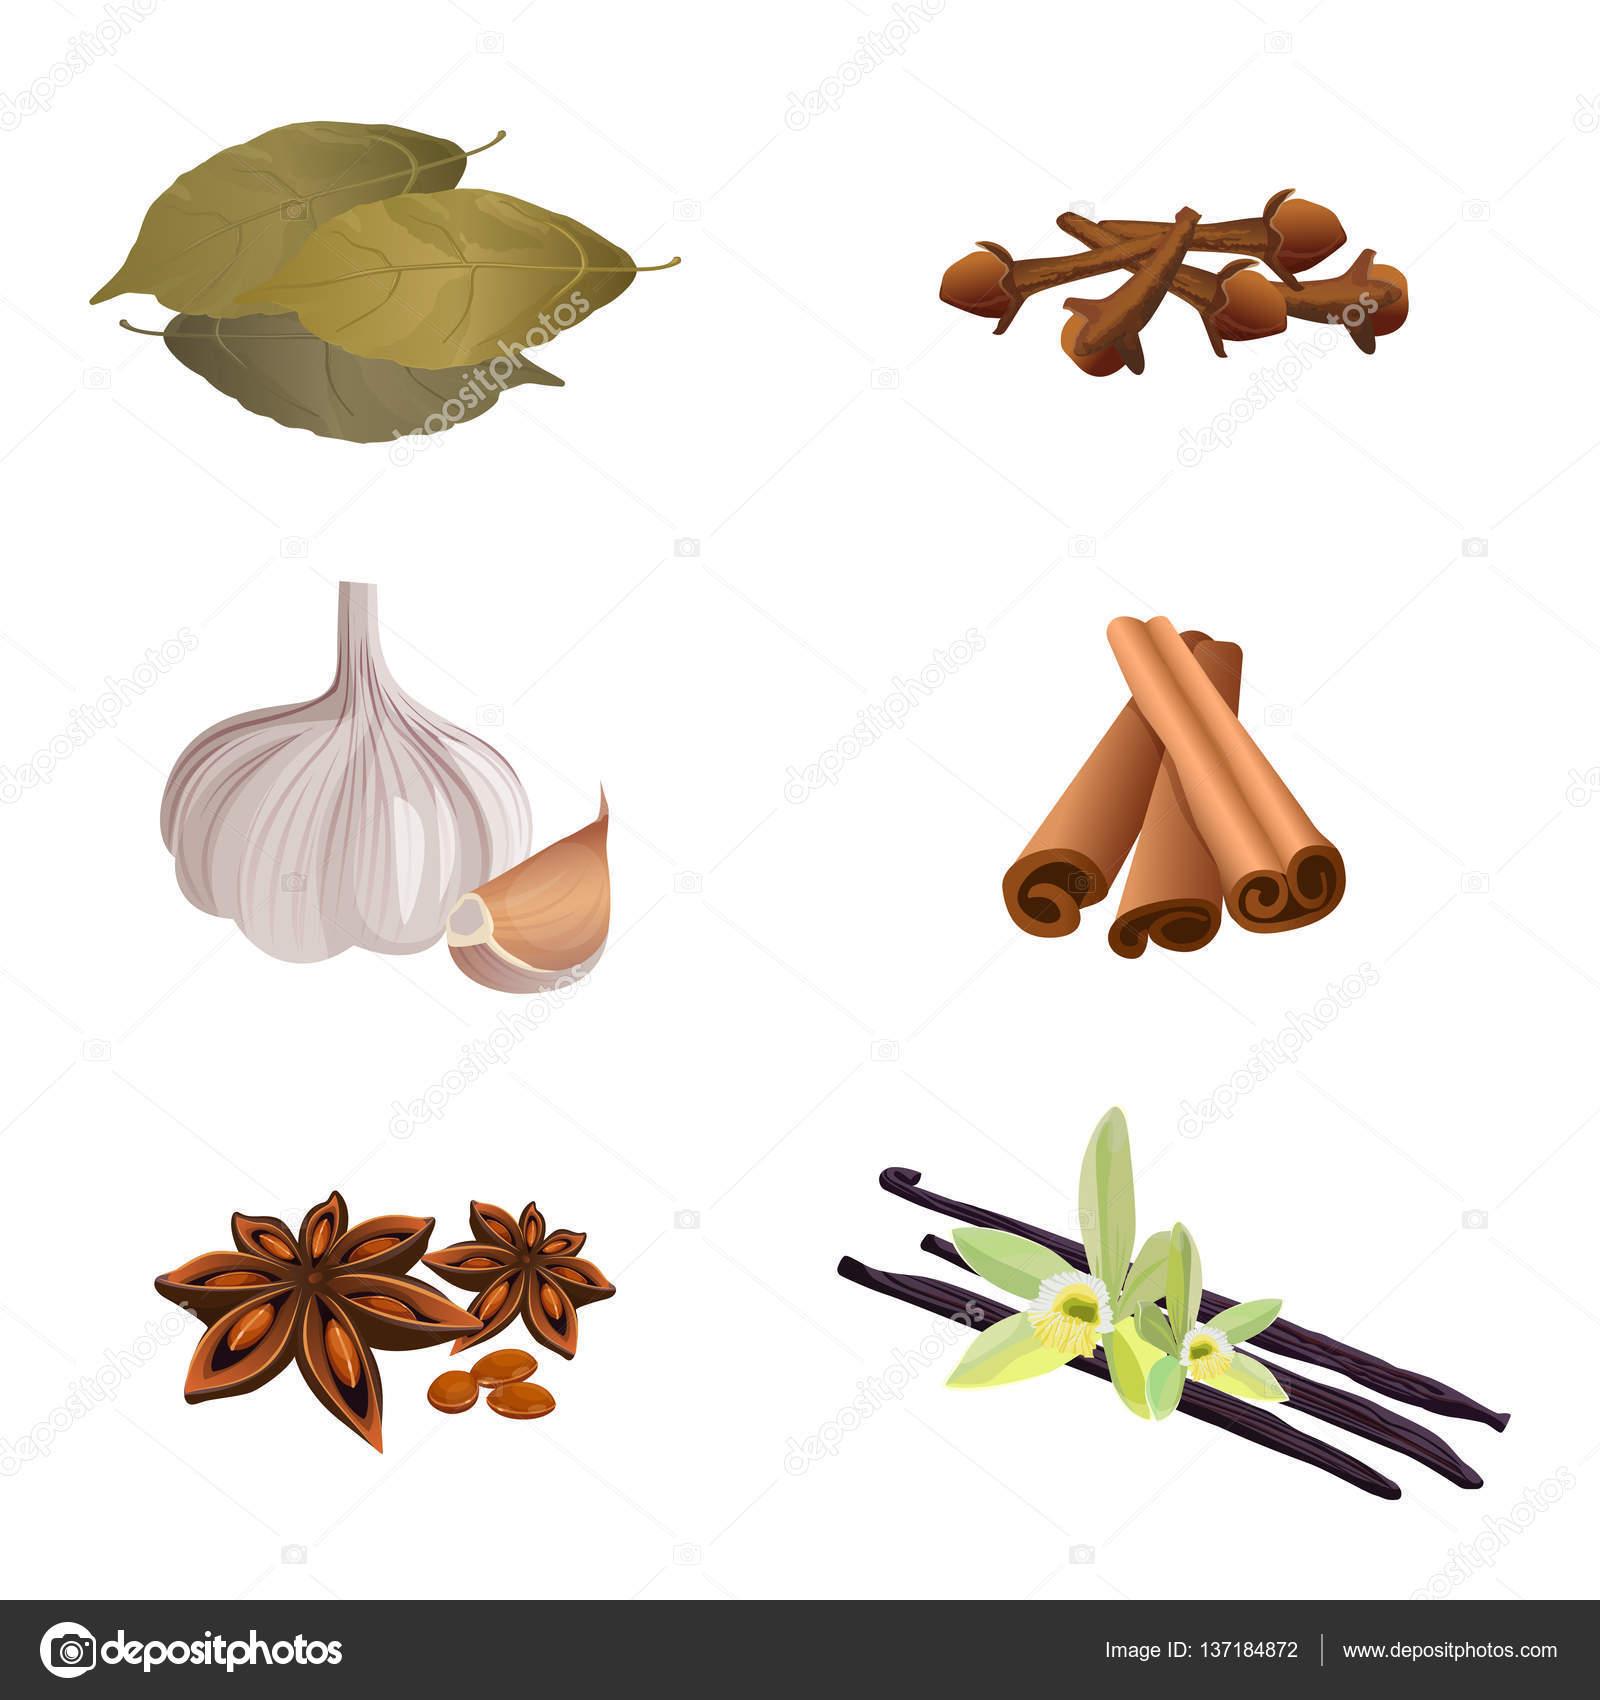 Garlic , cinnamon sticks, dried cloves, bay leaves, anise star.